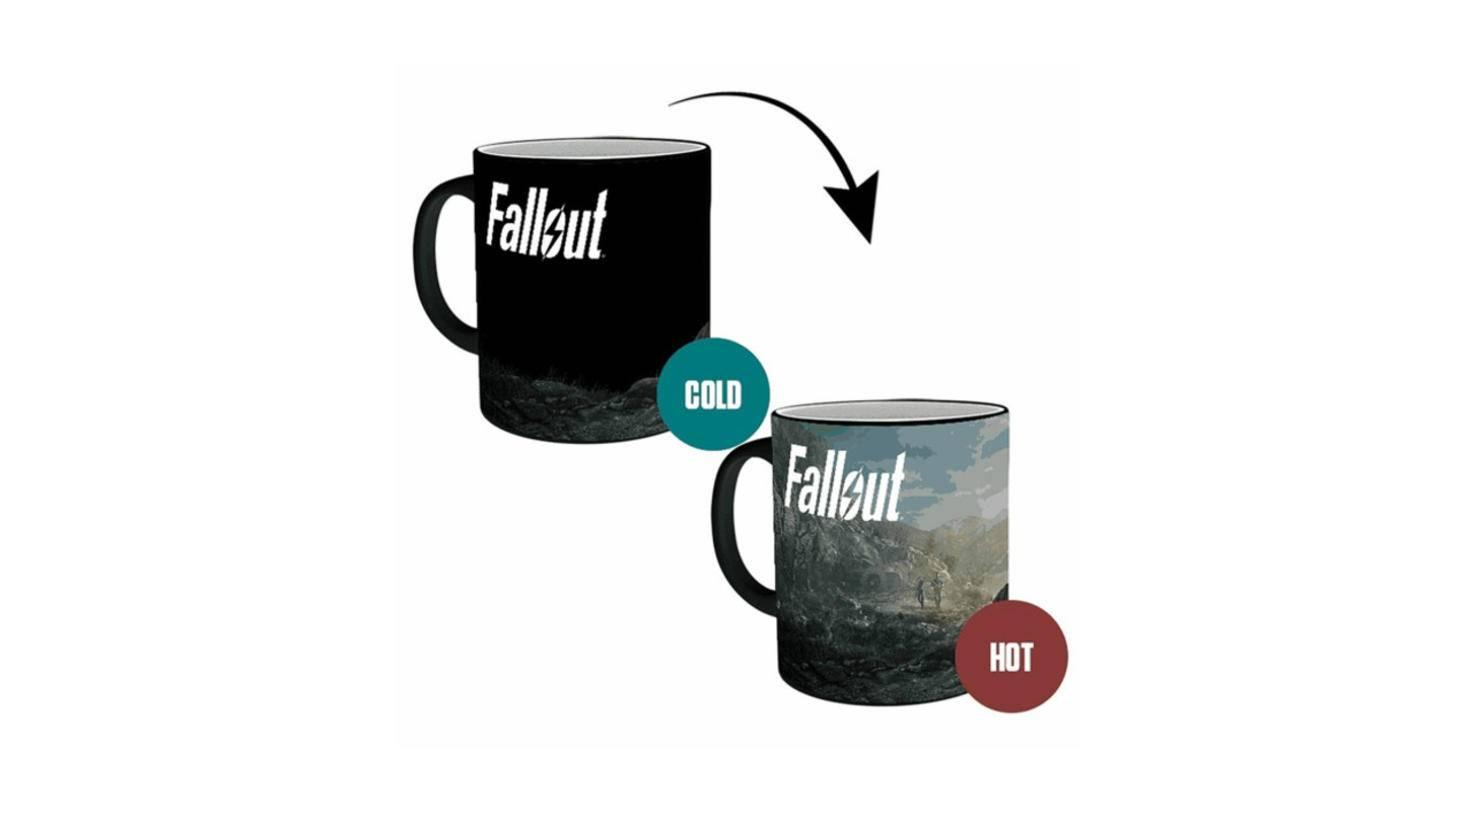 fallout-tasse